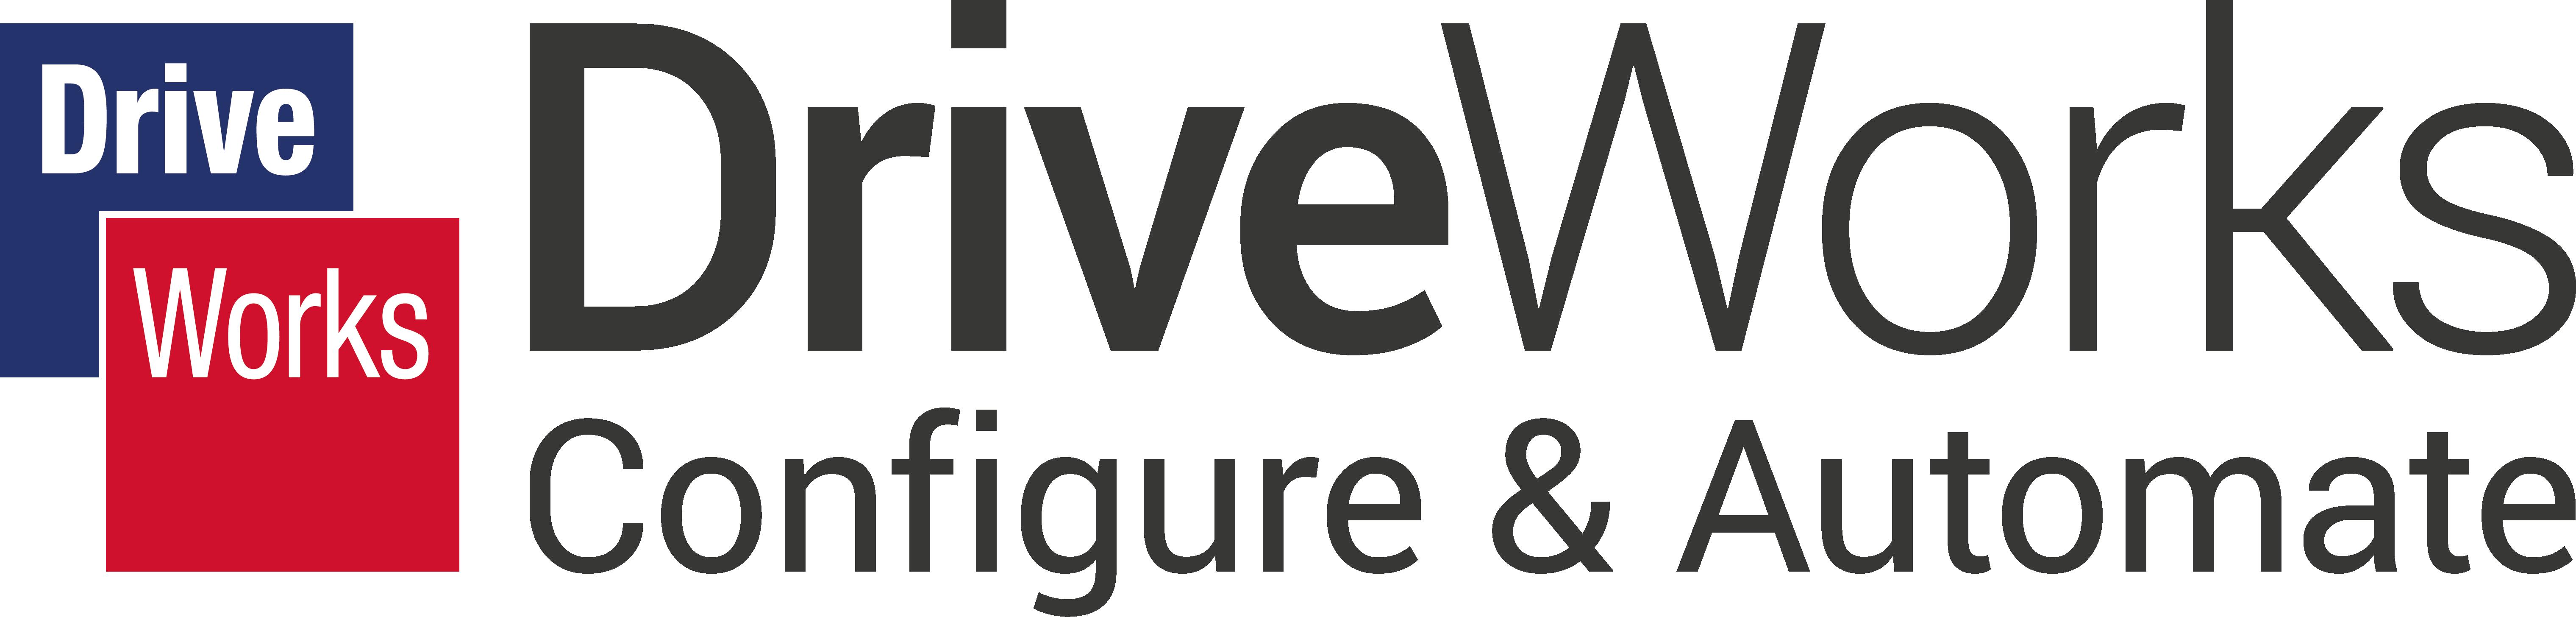 DriveWorksLogo-Configure&Automate-Black-Print